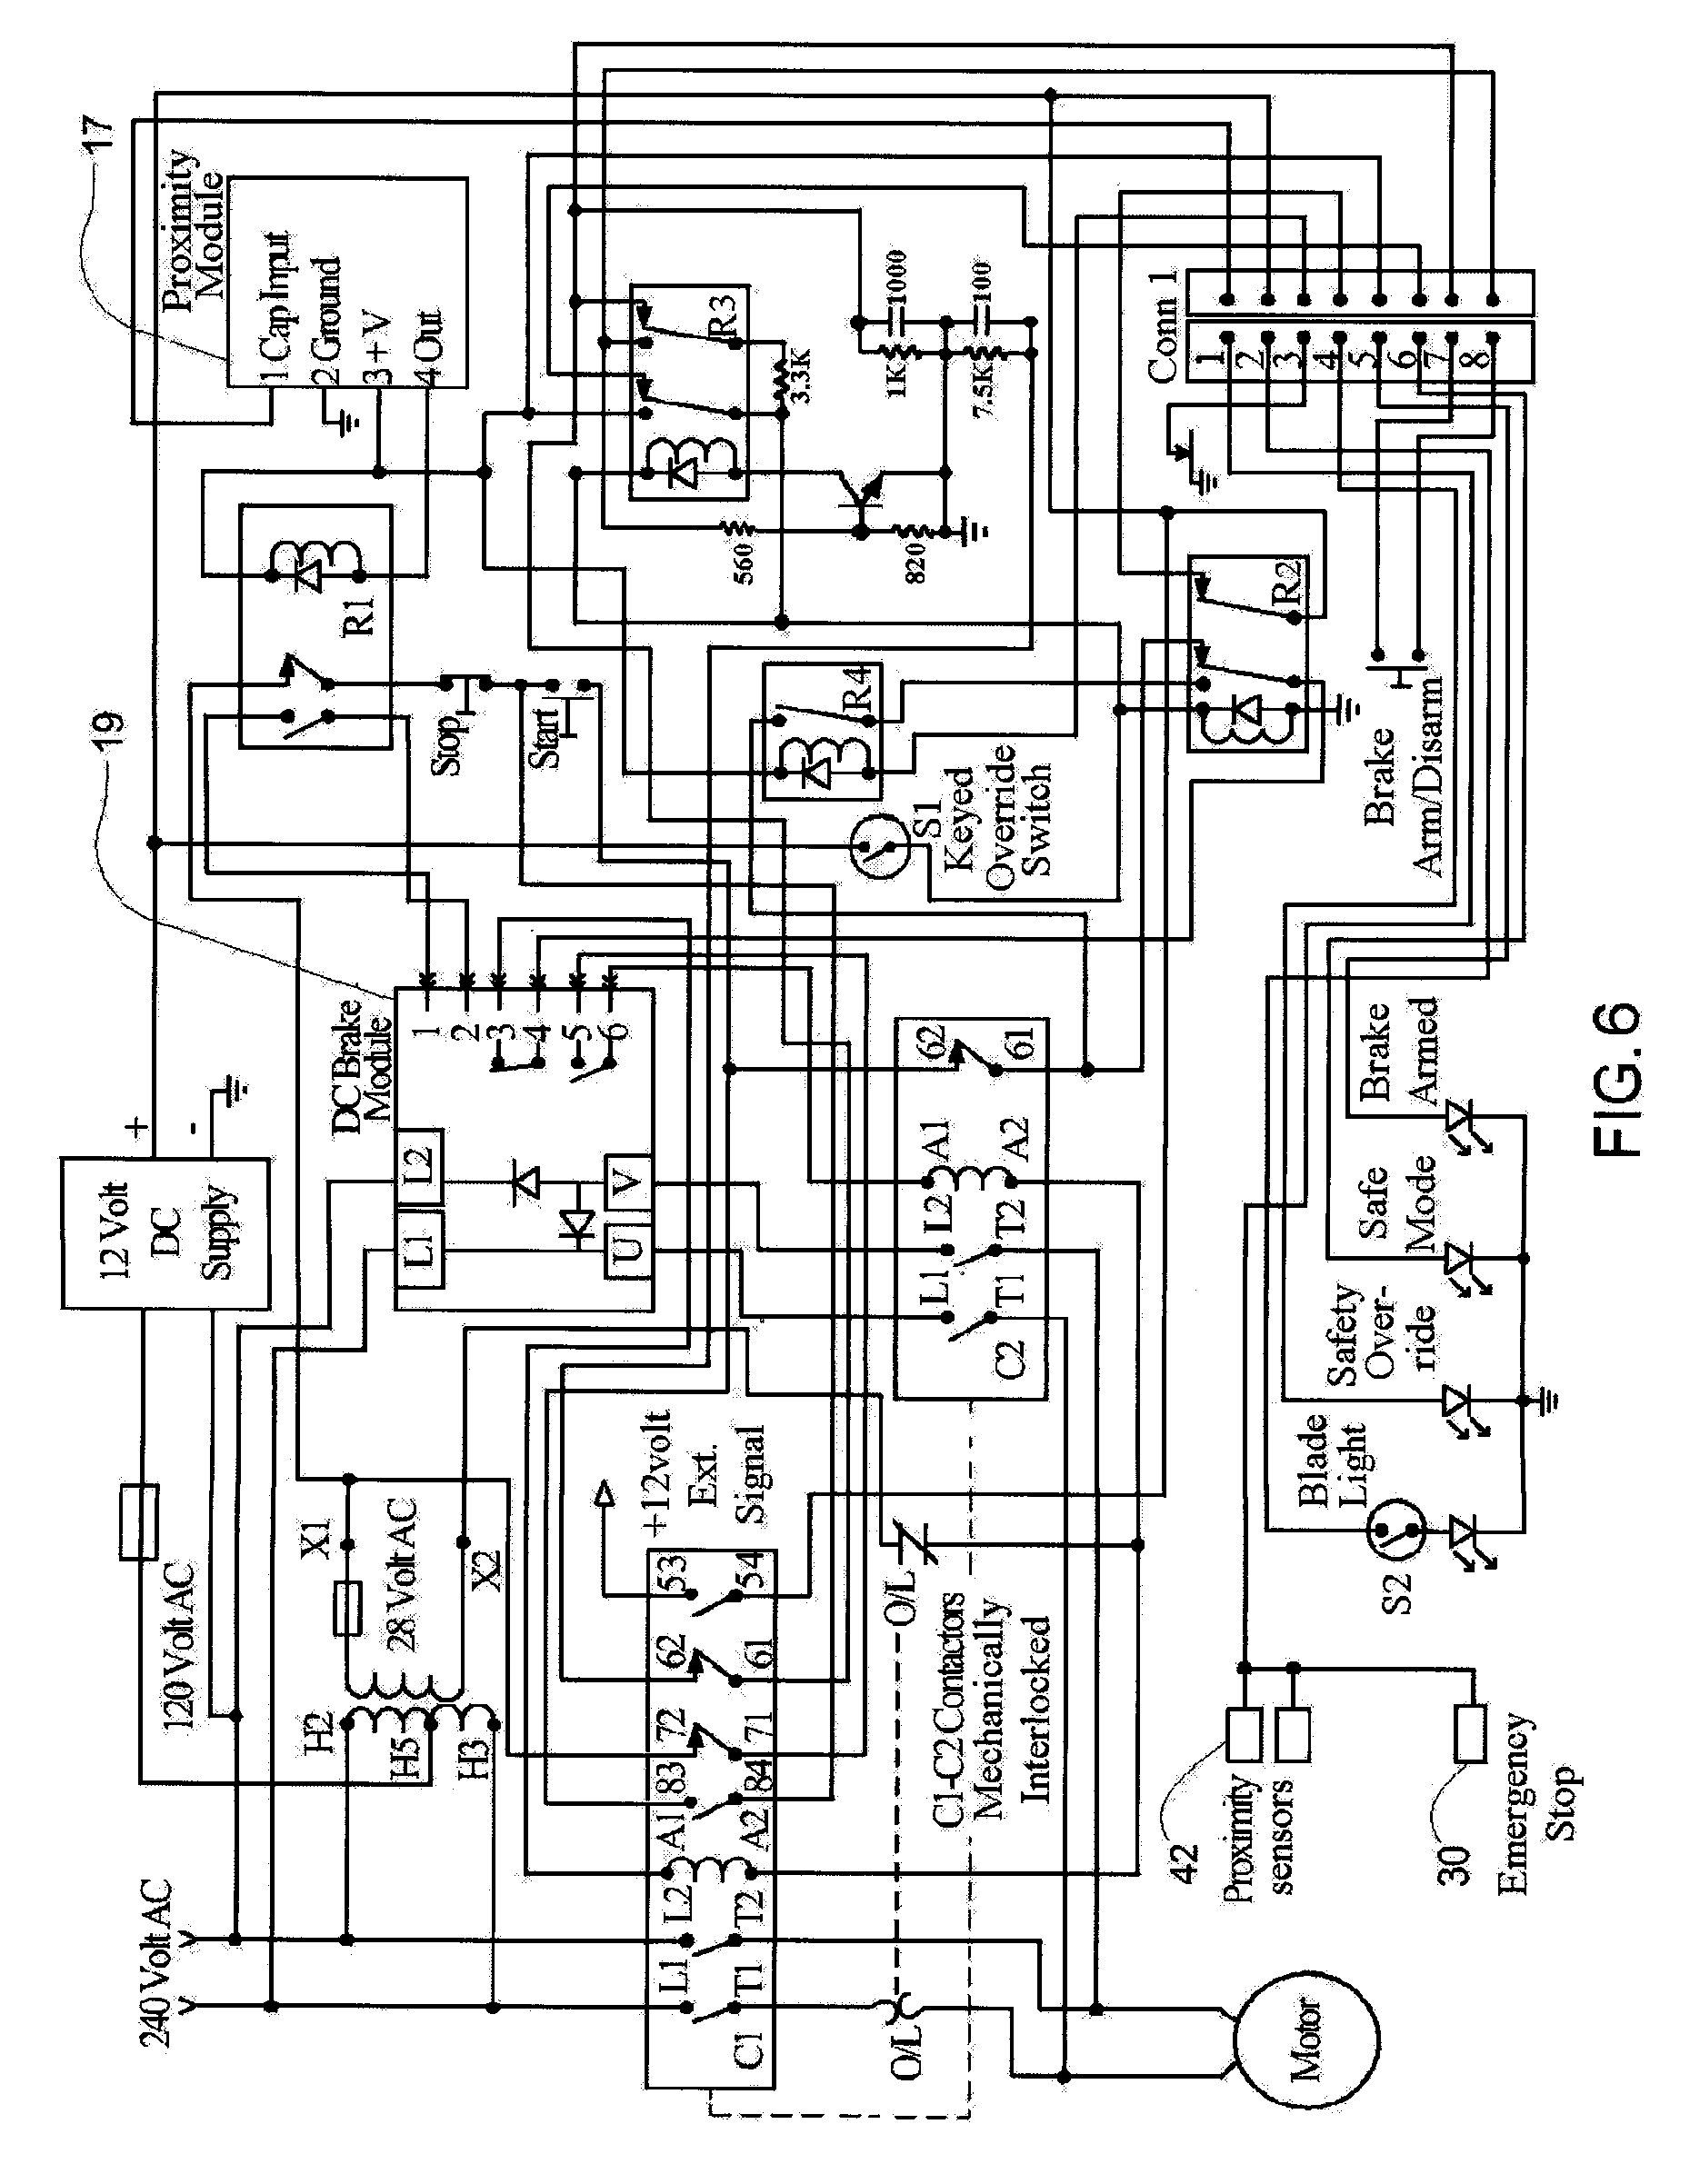 Inspiring 2005 Honda Civic O2 Sensor Wiring Diagram Pictures - Best ...